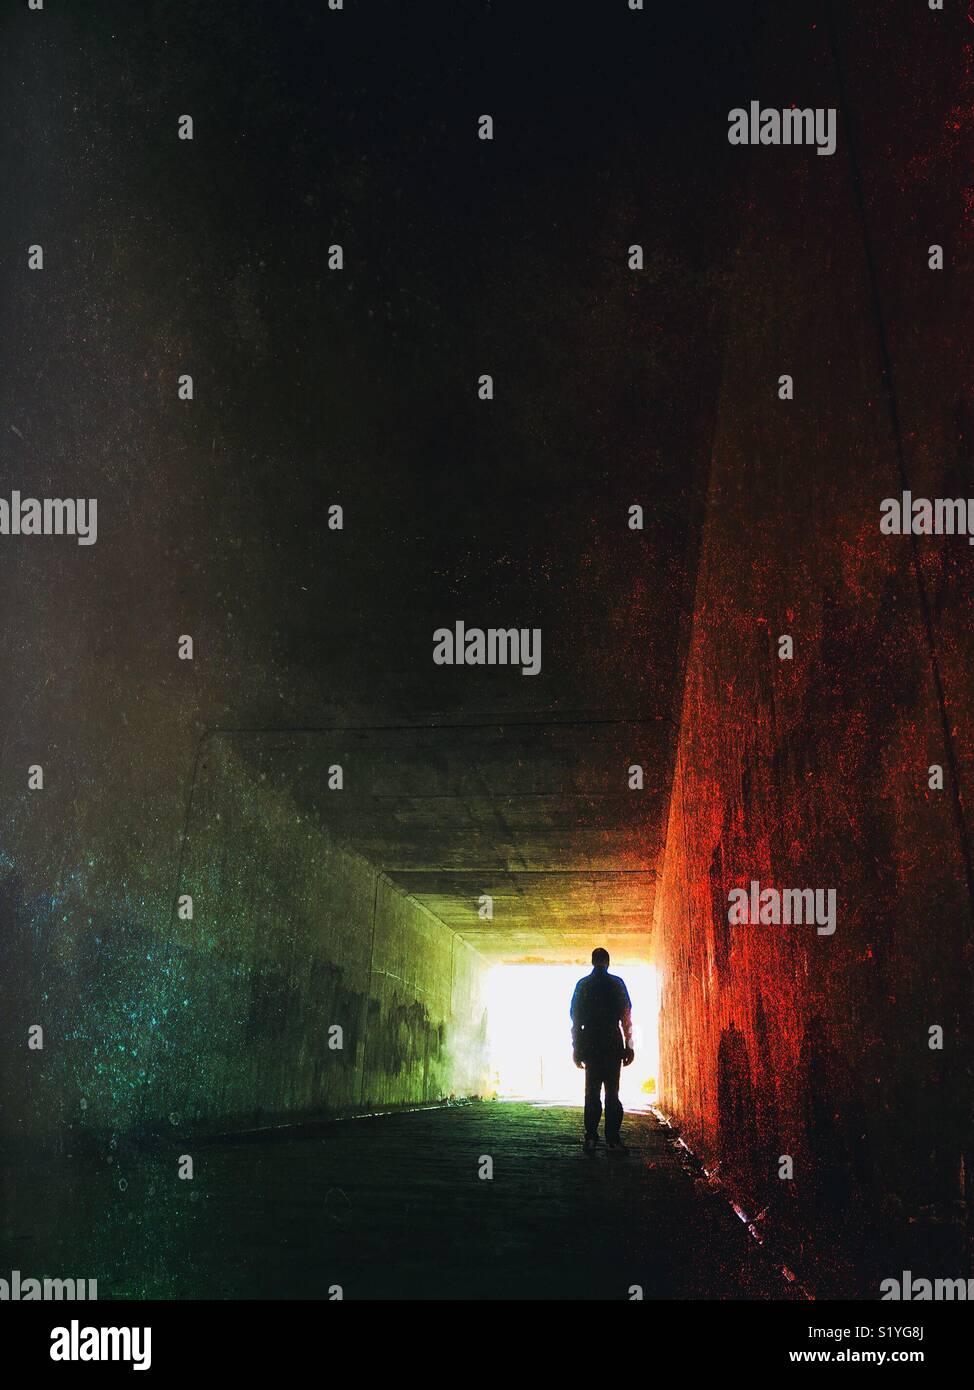 Silueta de un hombre se situó en un túnel Imagen De Stock